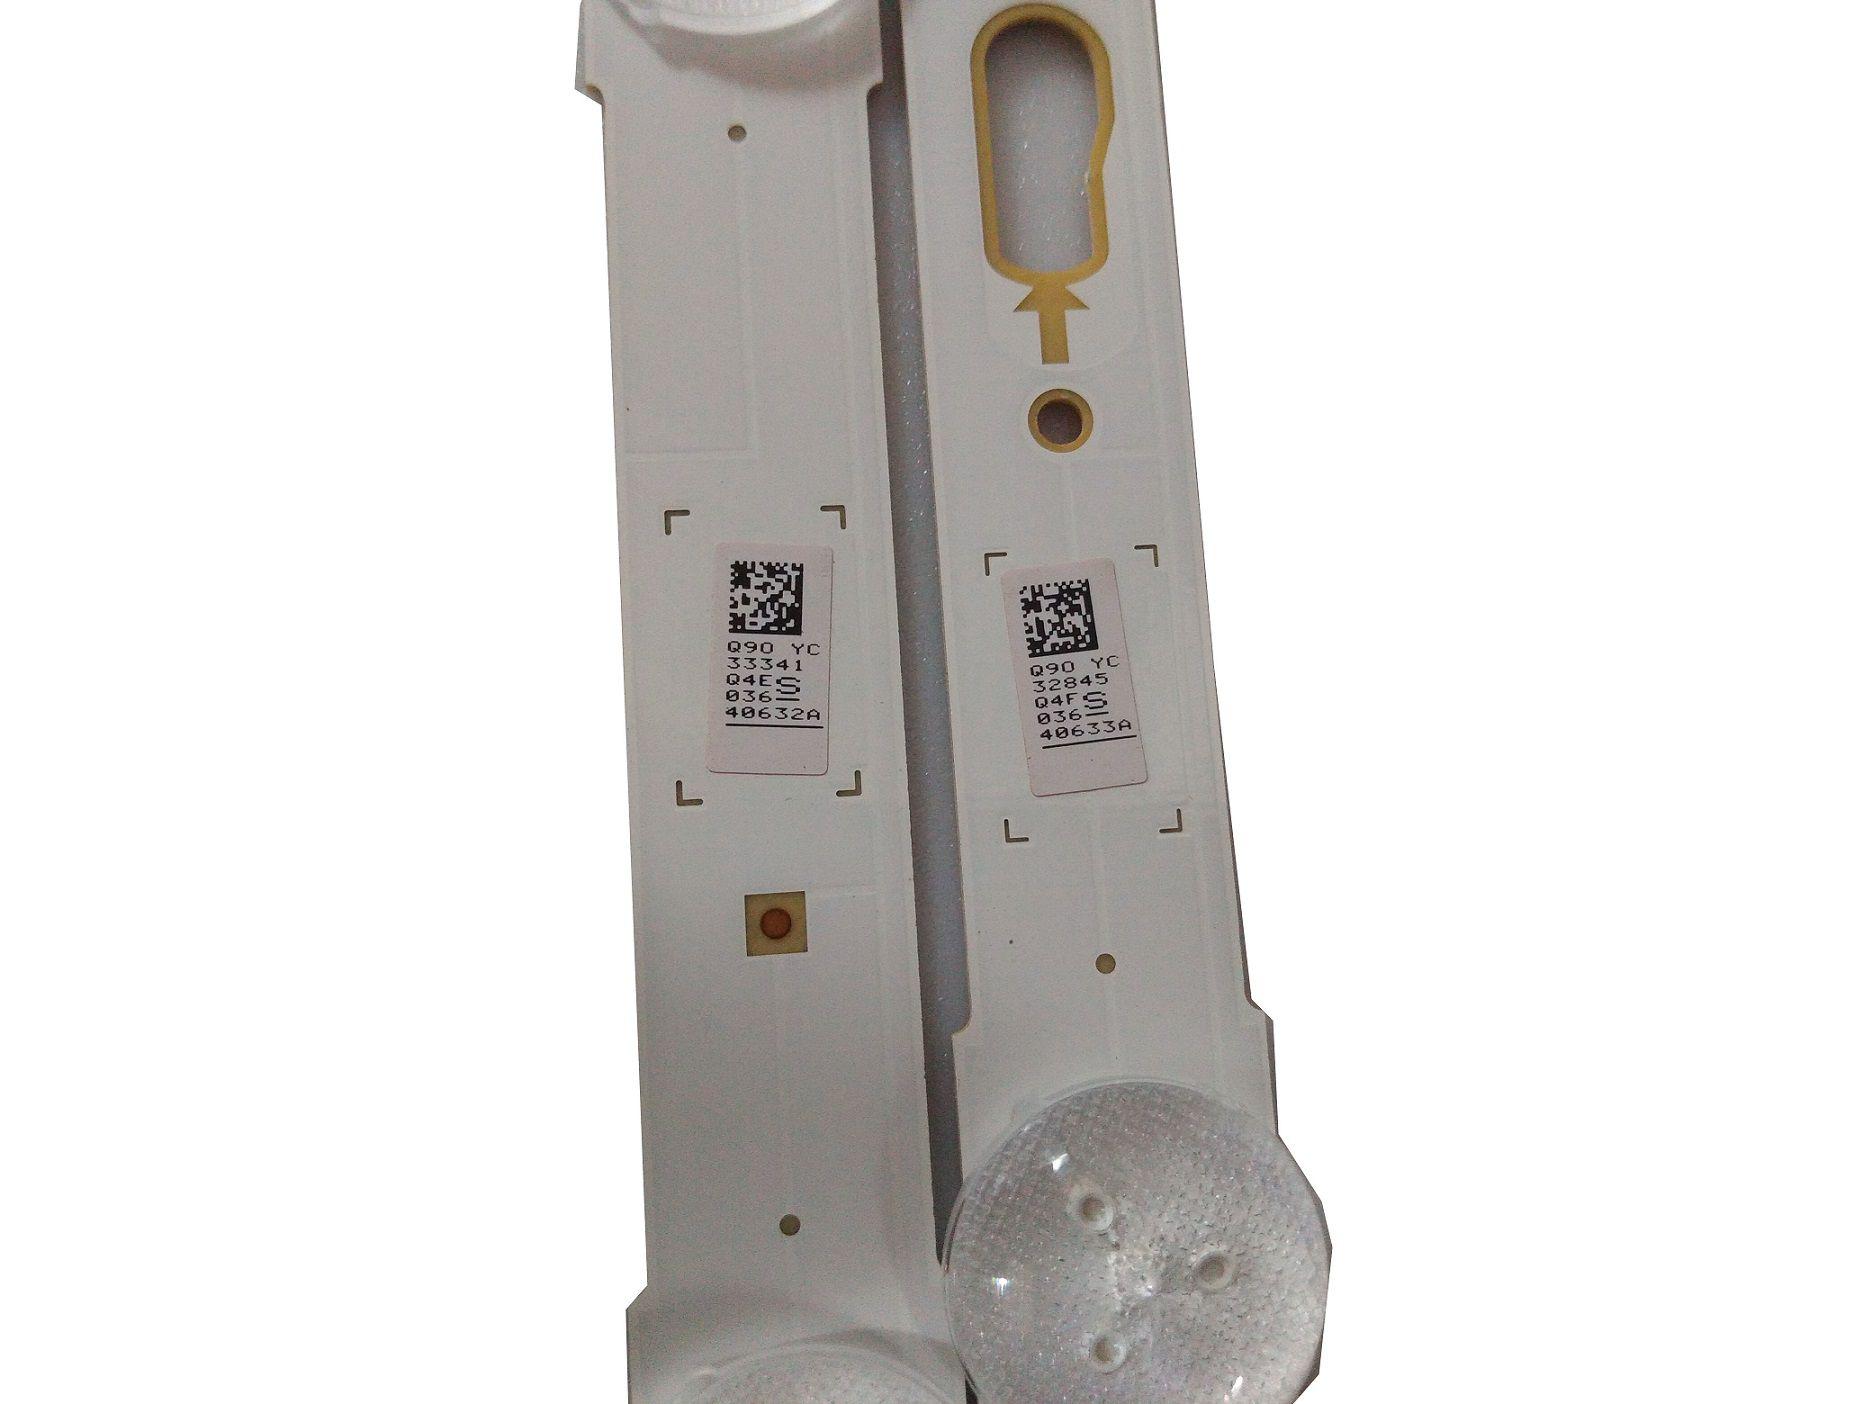 KIT BARRA DE LED SAMSUNG UN49KU6300G UN49MU6300G UN49MU6100G 40632A + 40633A